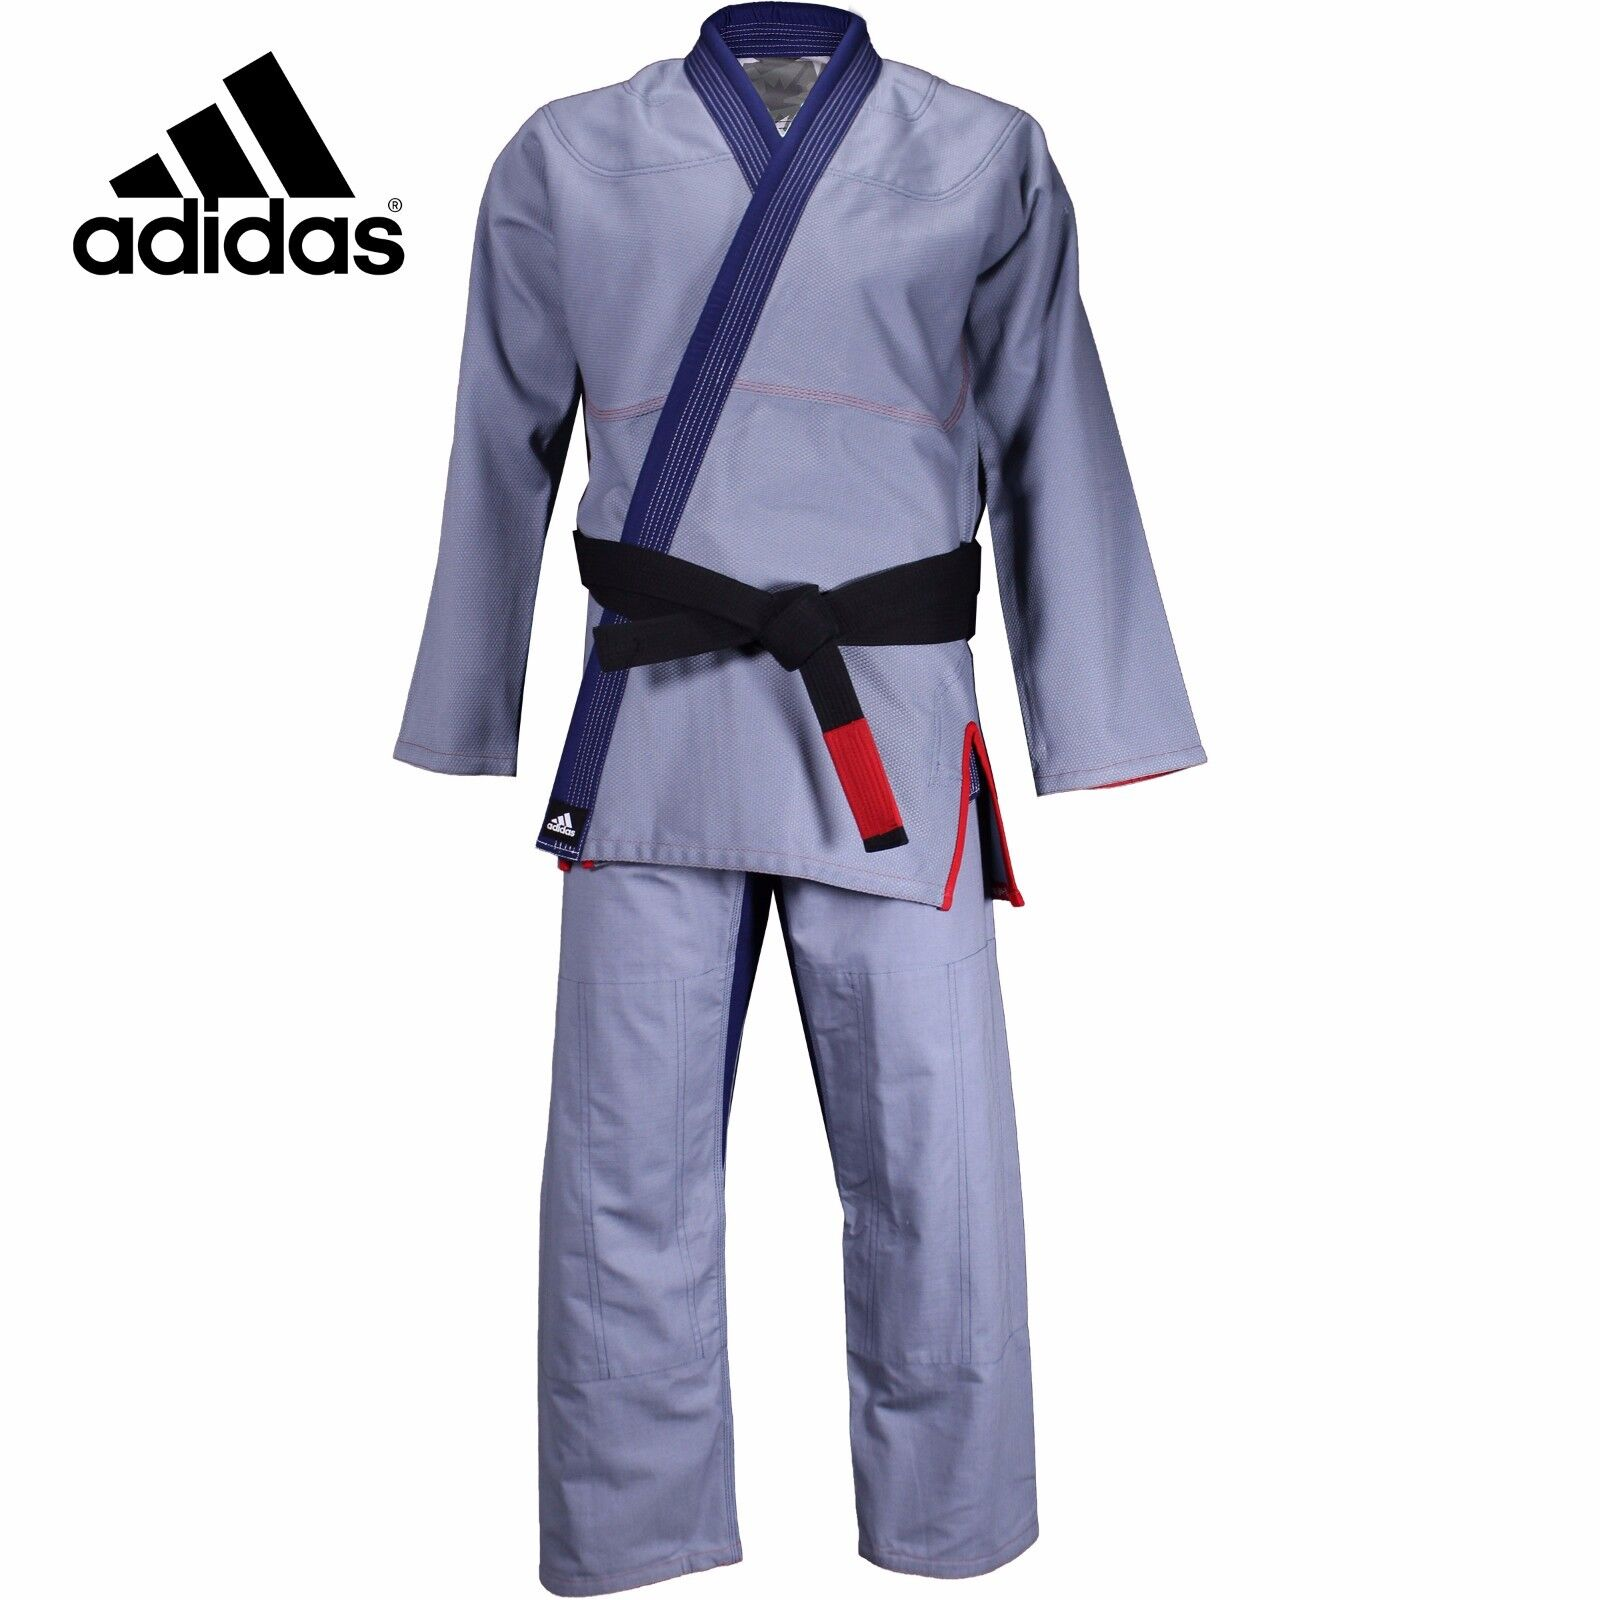 Adidas Stars & Stripes Jiu Jitsu Gi BJJ Gi 450gr Pearl Weave With Adidas Gi Bag